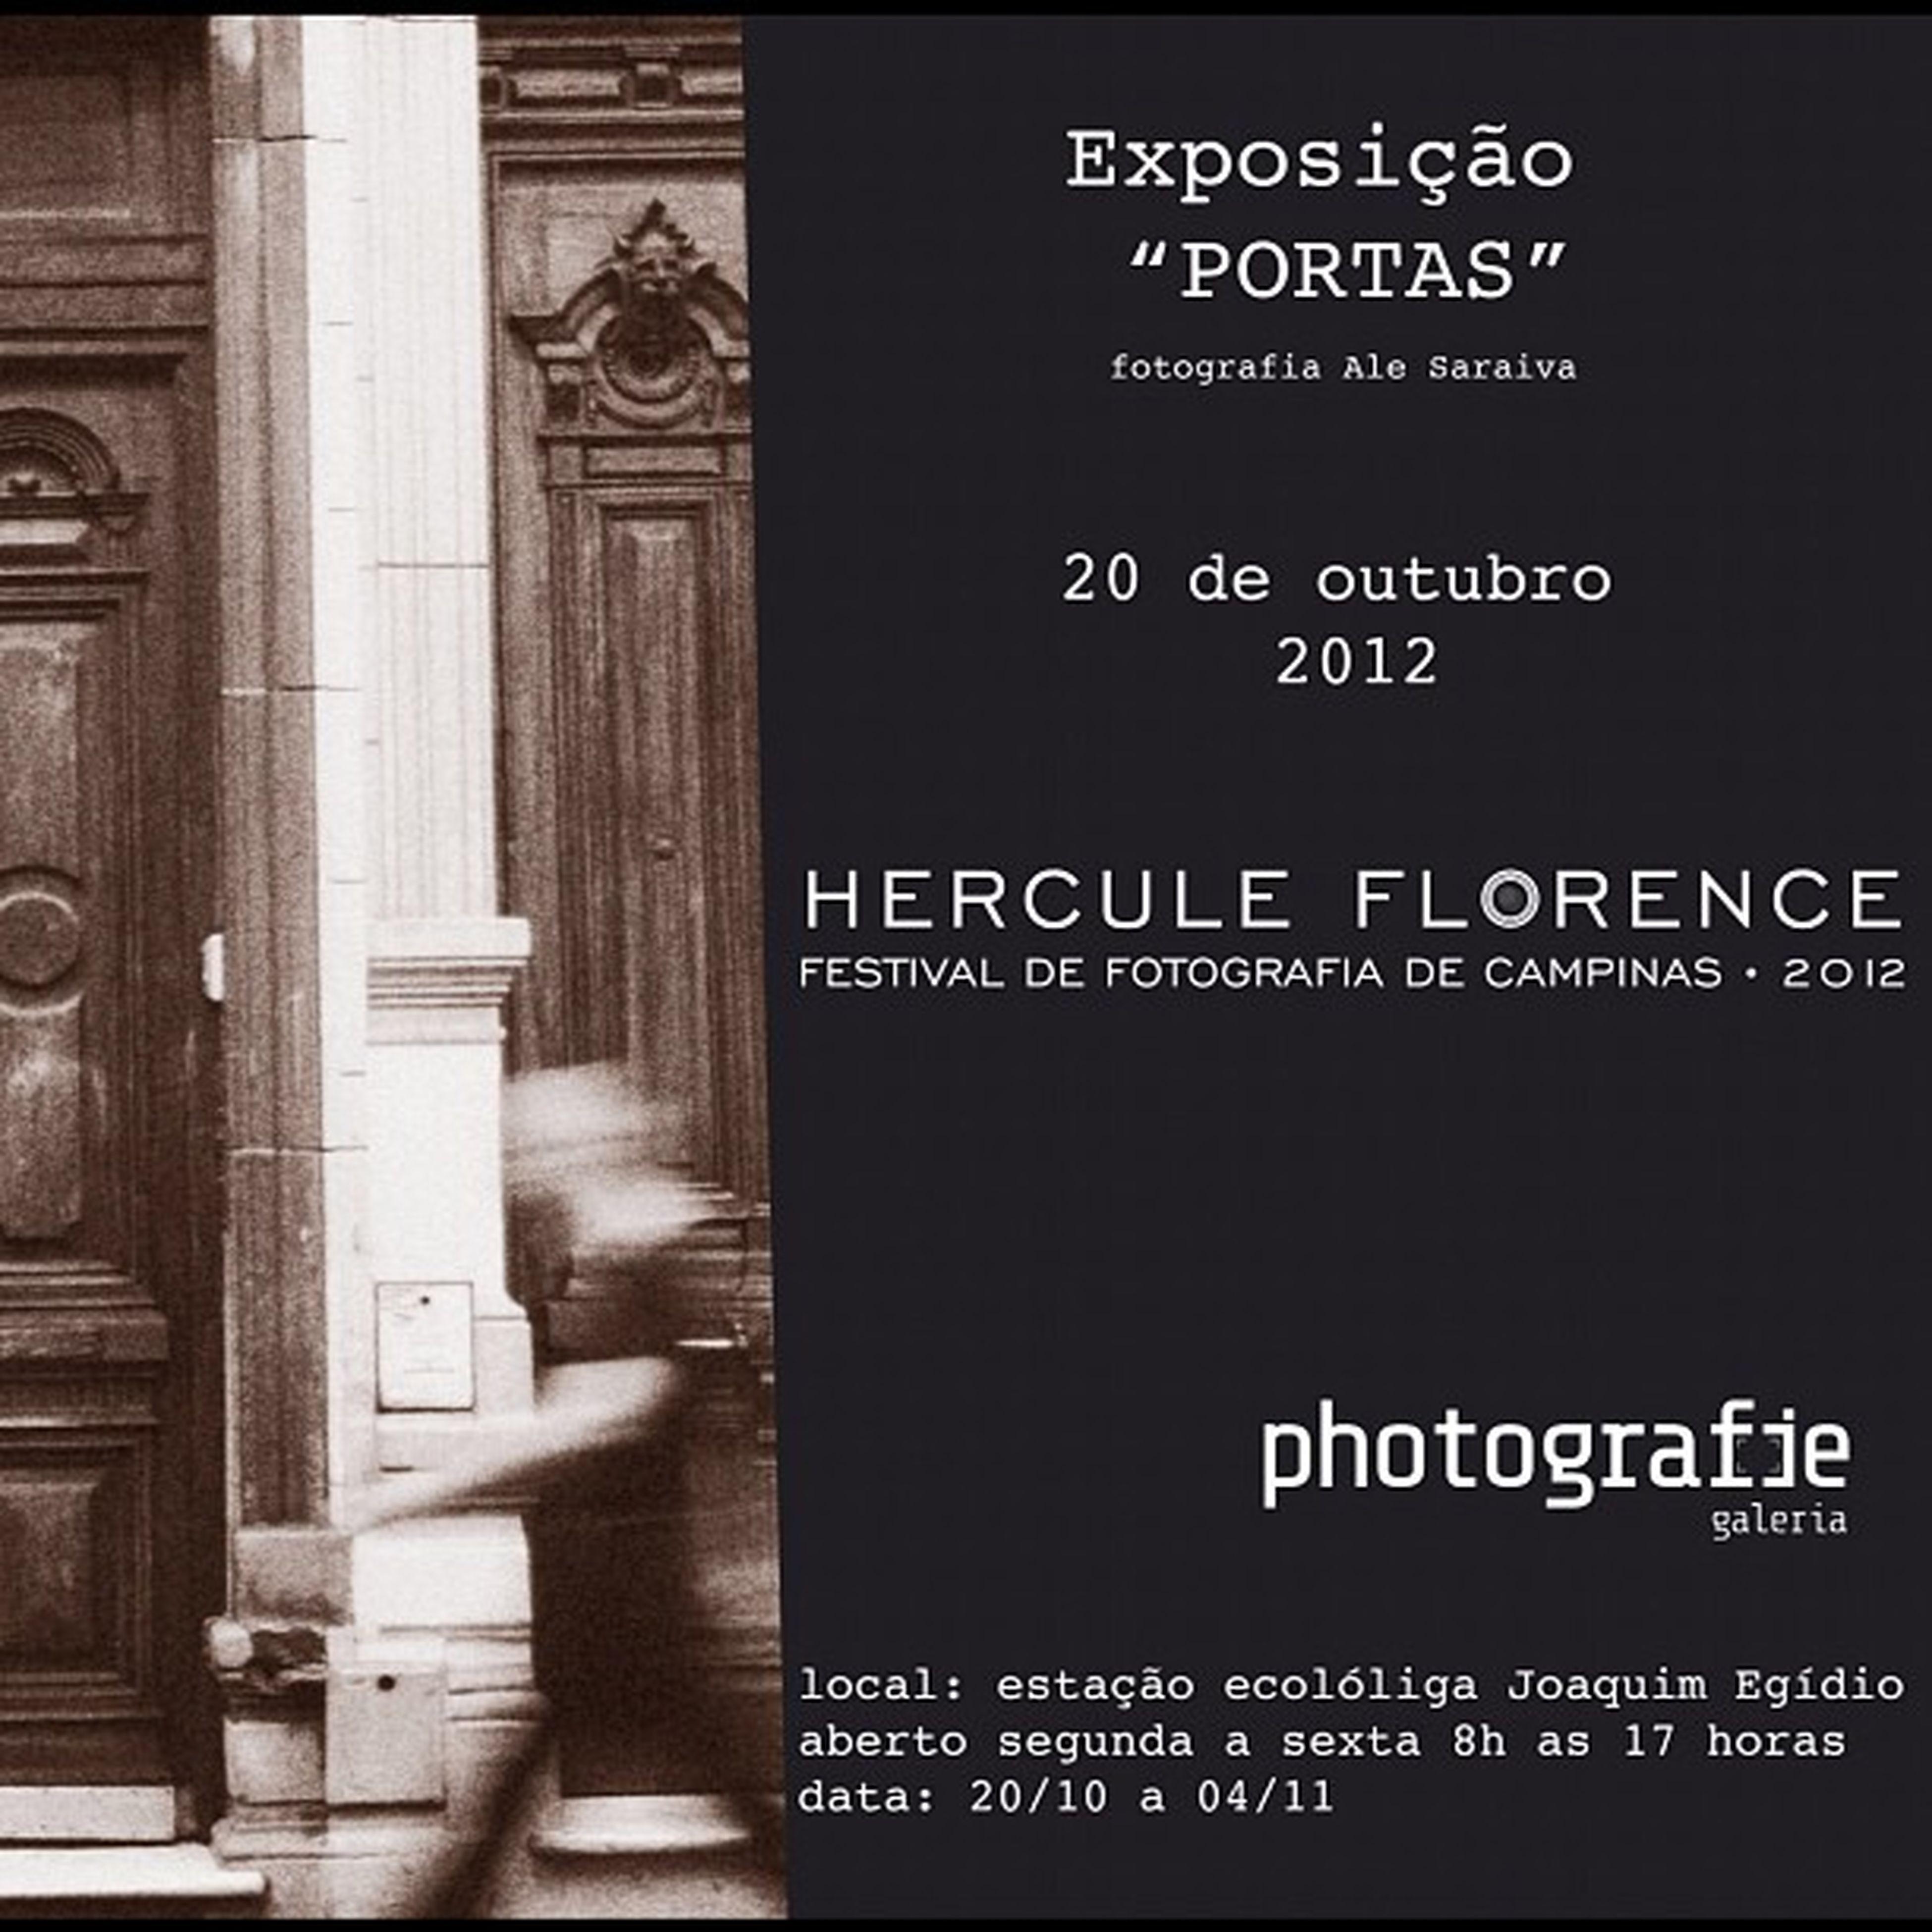 Herculeflorence Photografie Galeriaphotografie